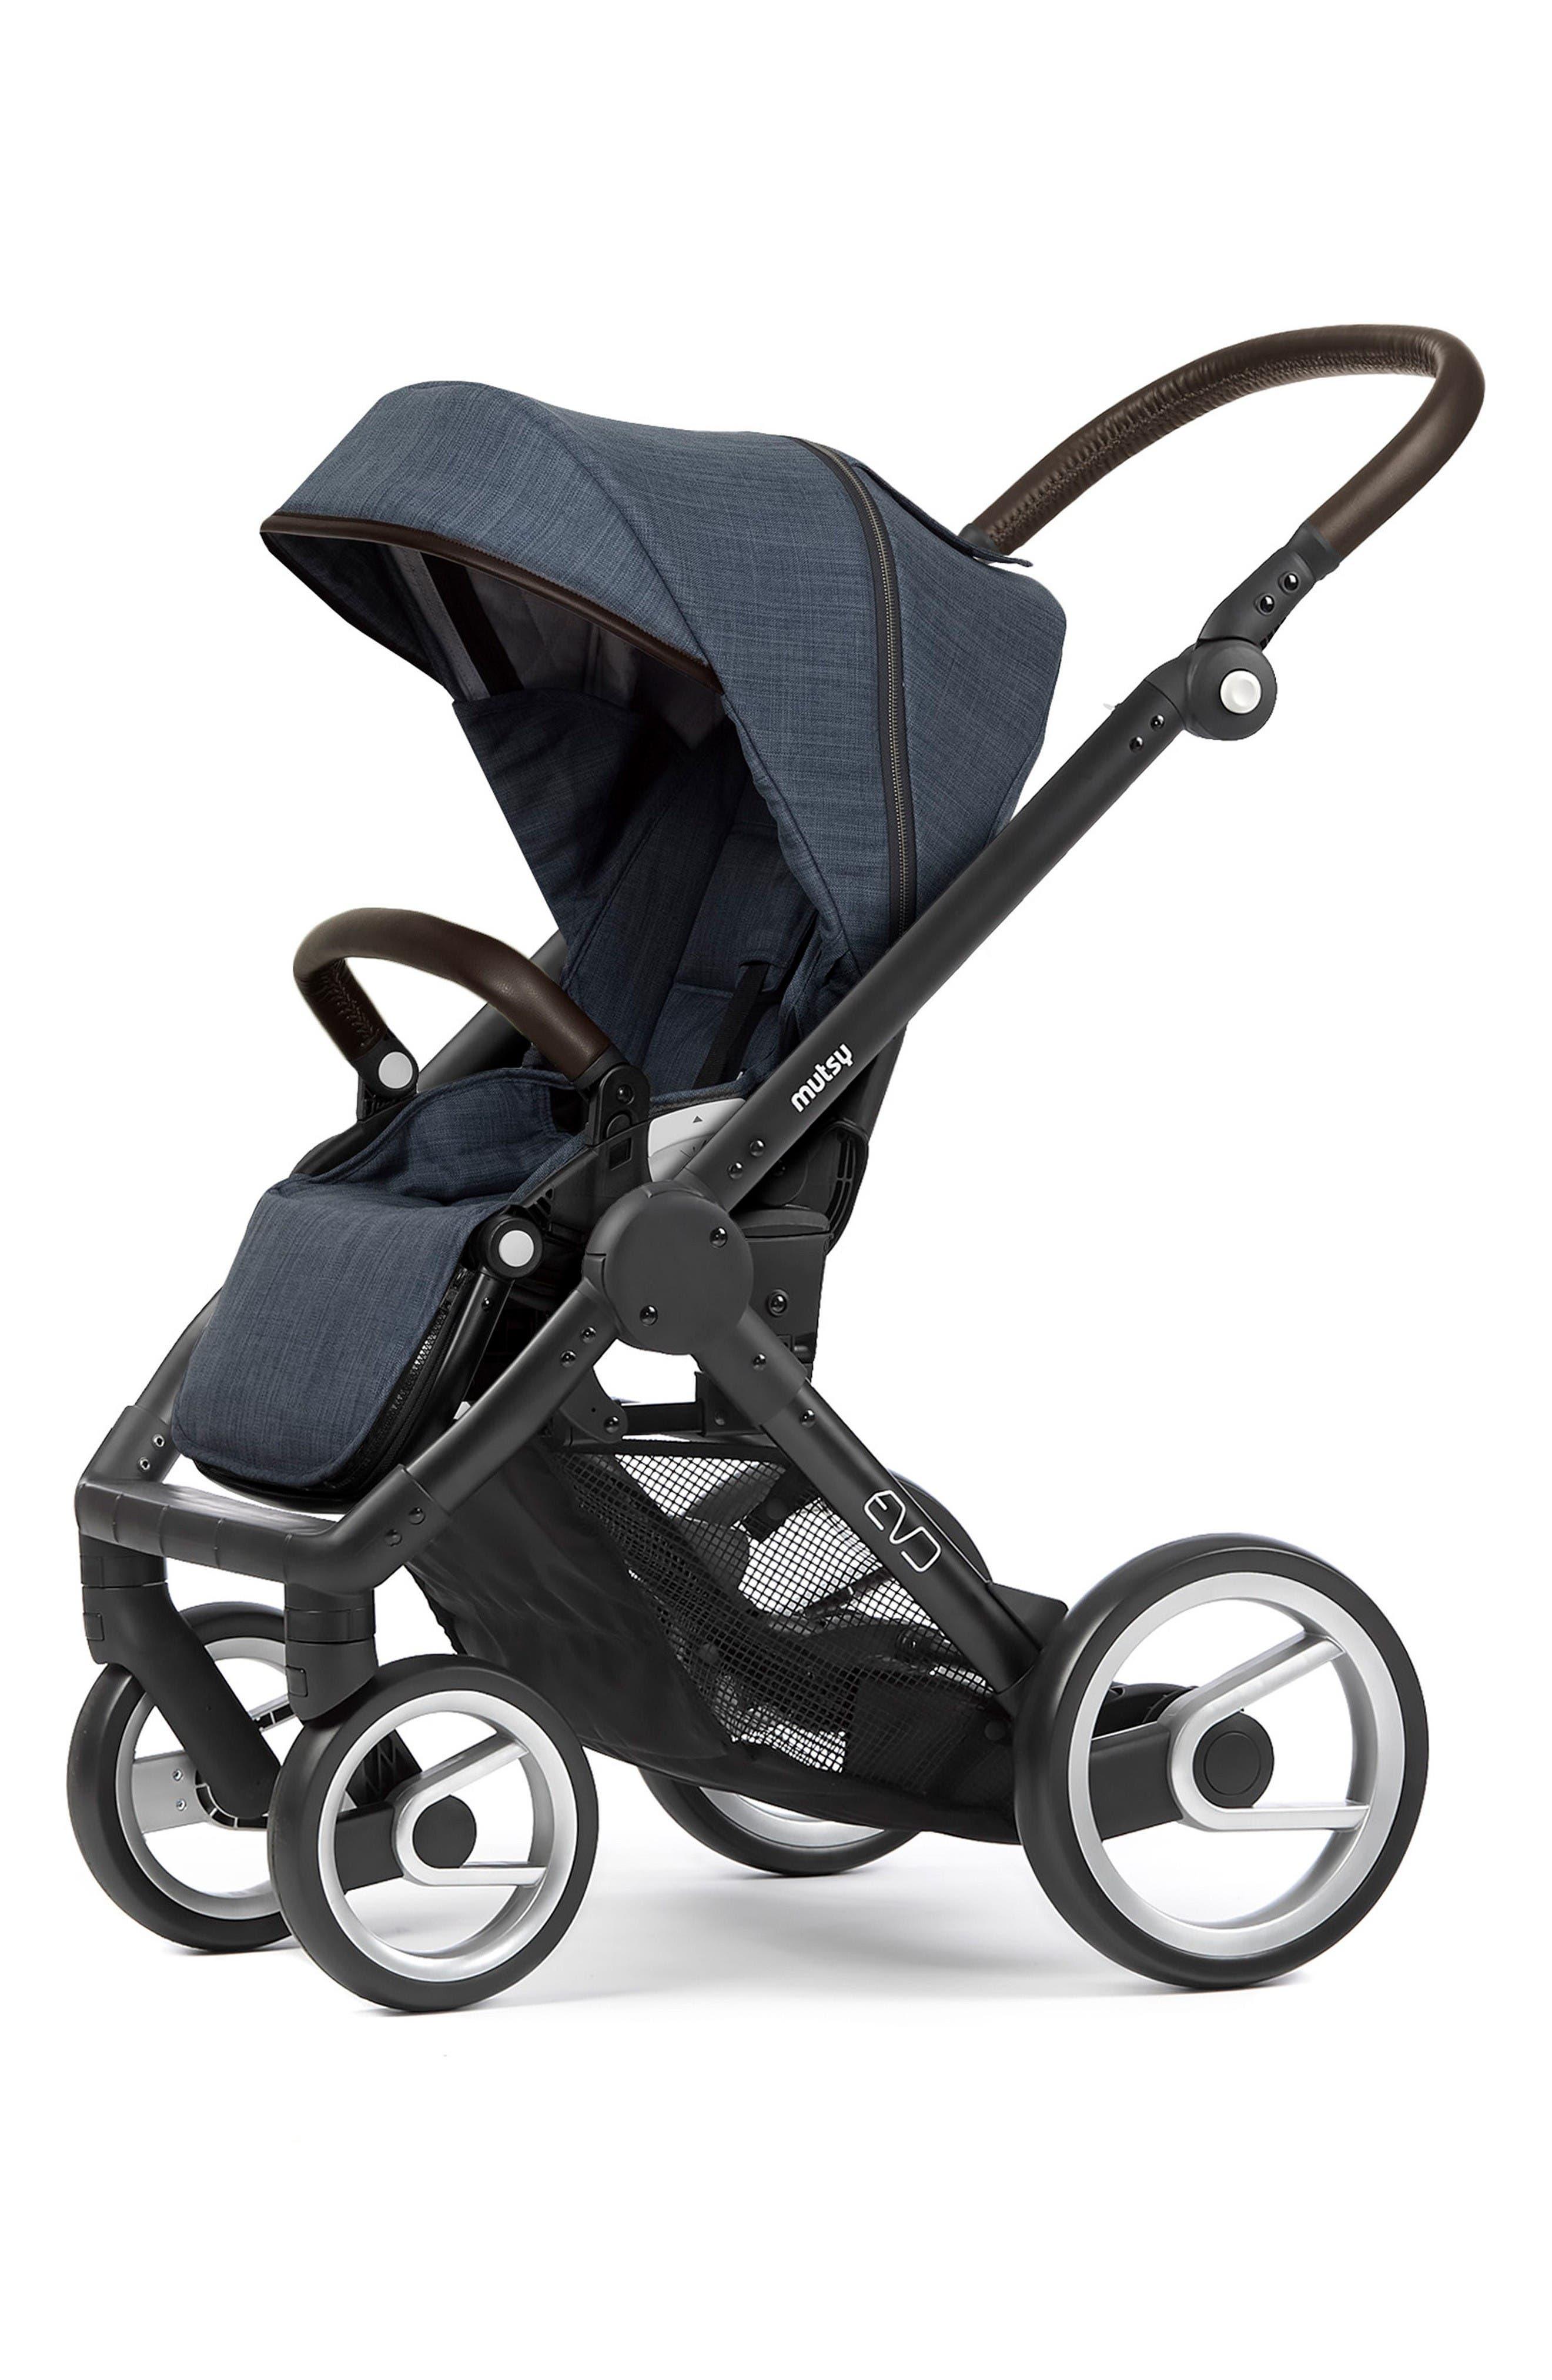 Evo - Farmer Earth Stroller,                         Main,                         color, Black/ Blue